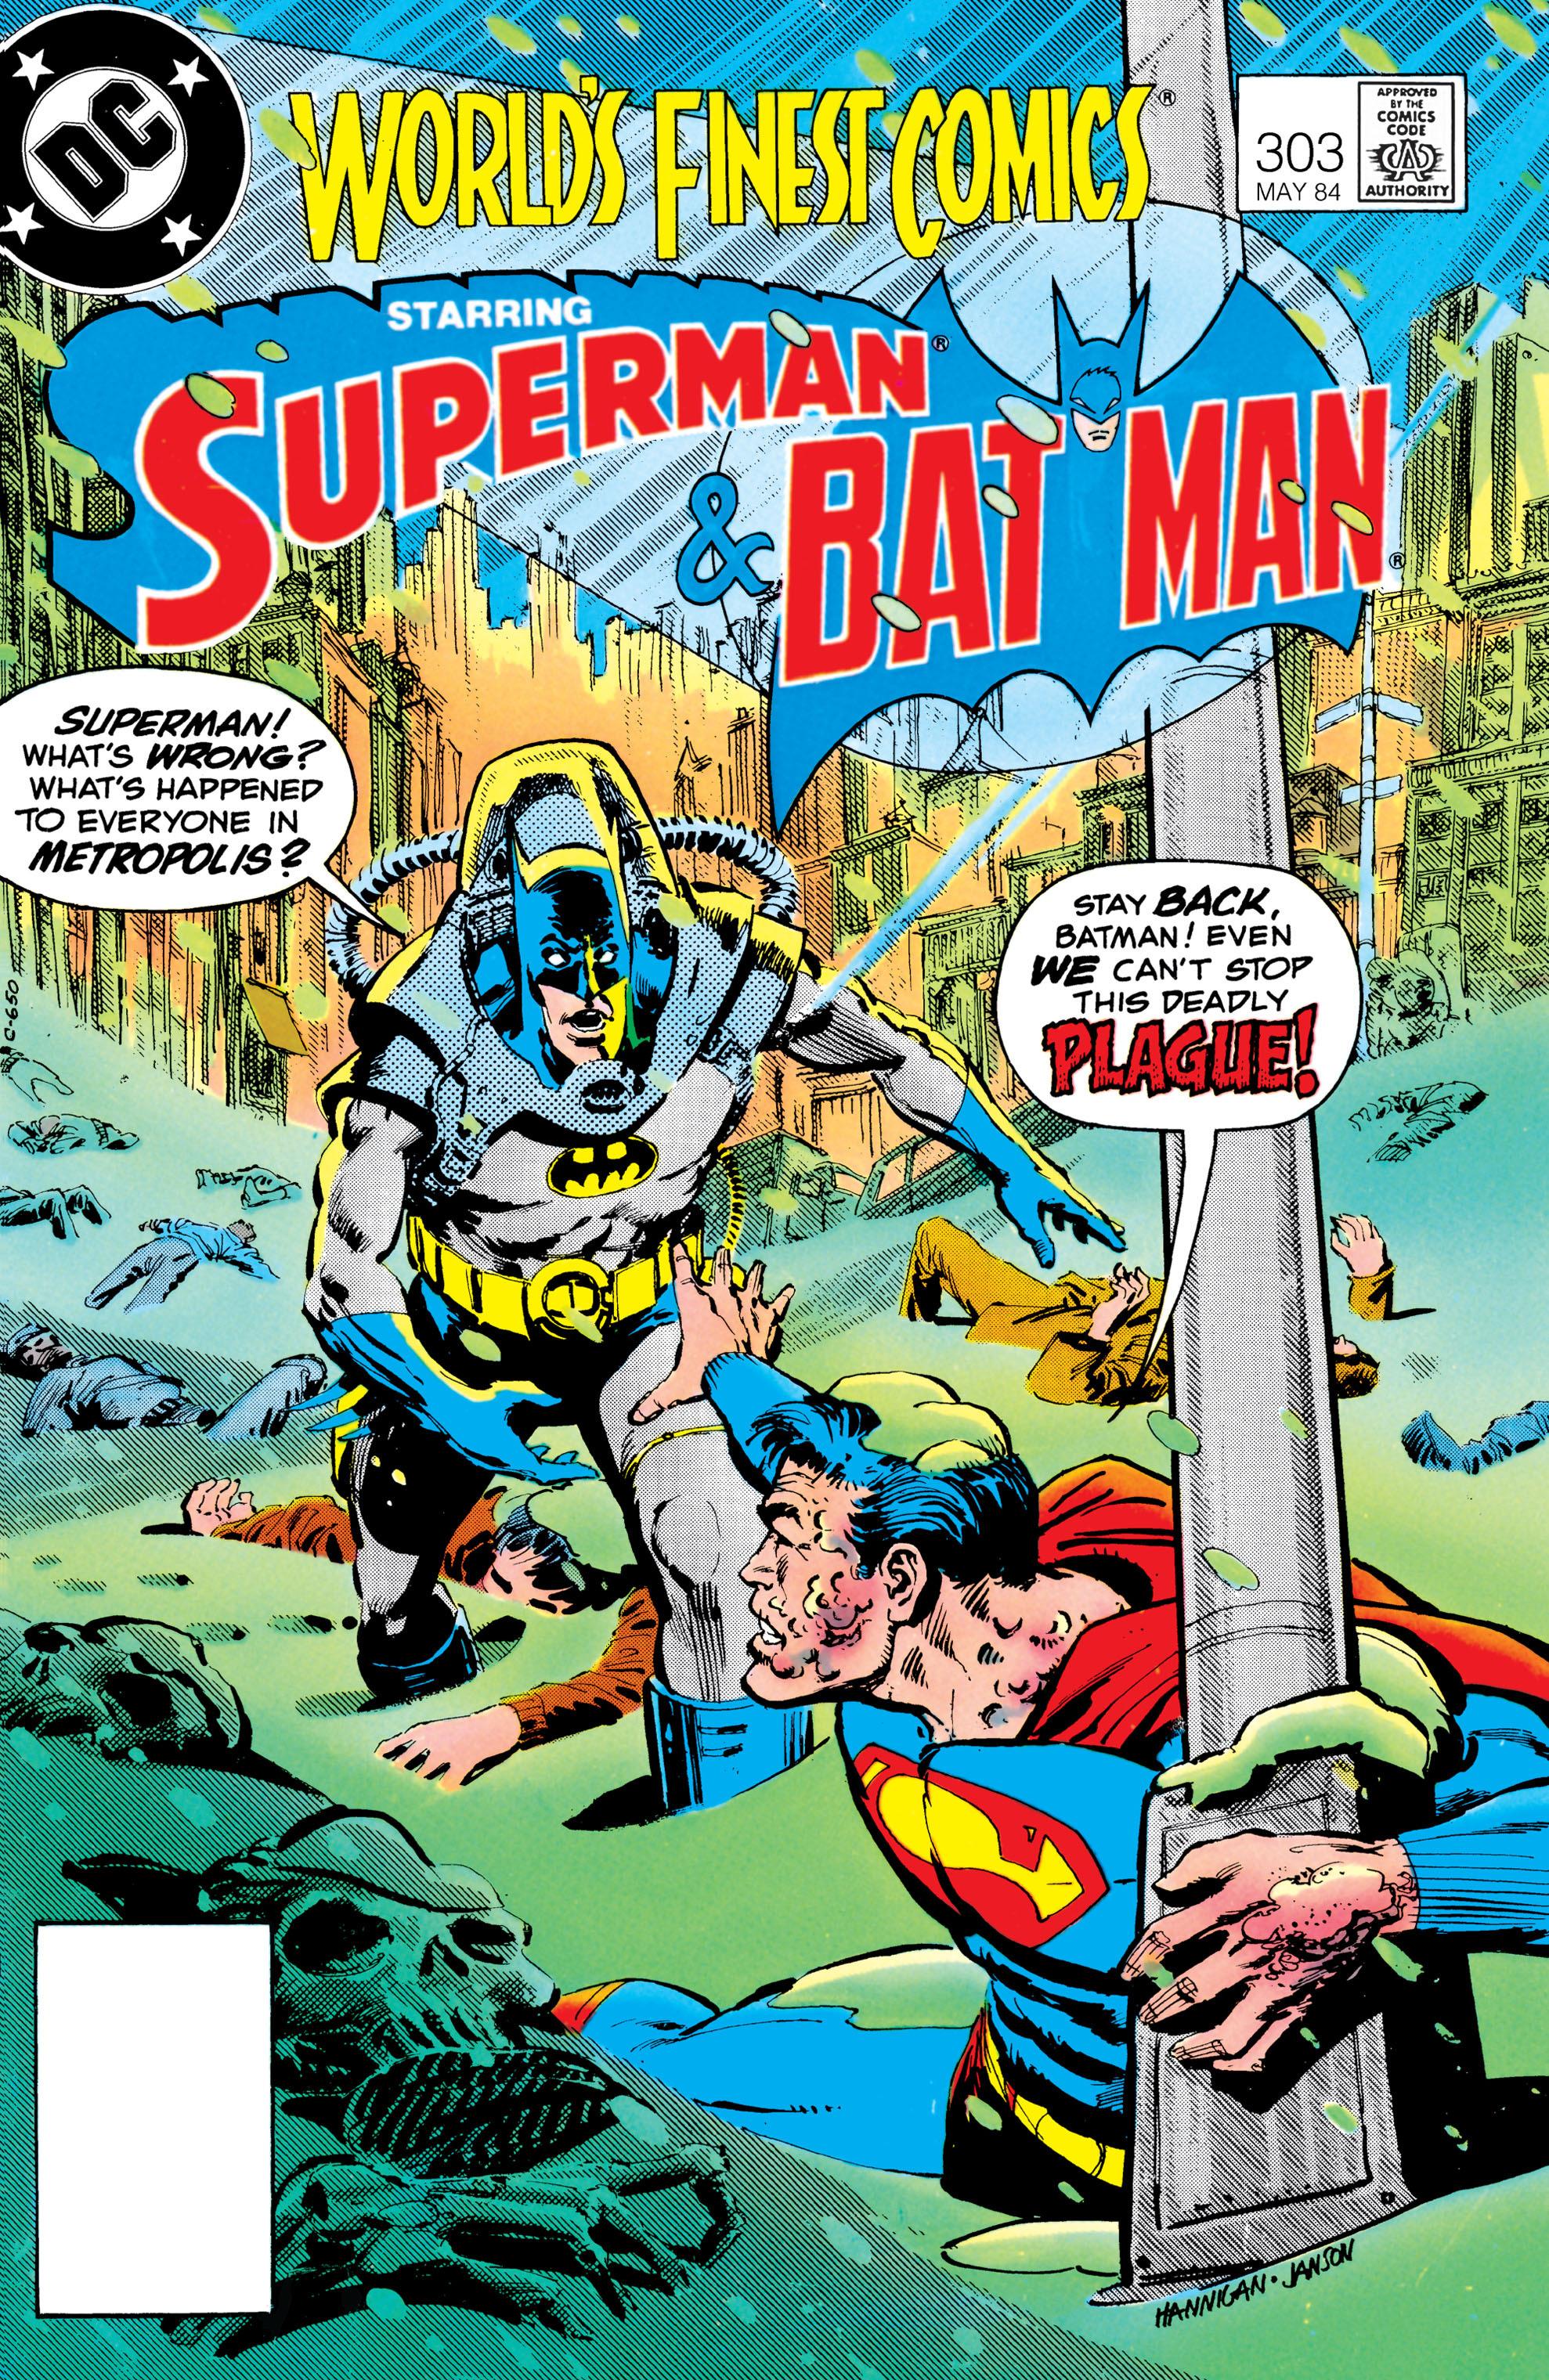 Read online World's Finest Comics comic -  Issue #303 - 1